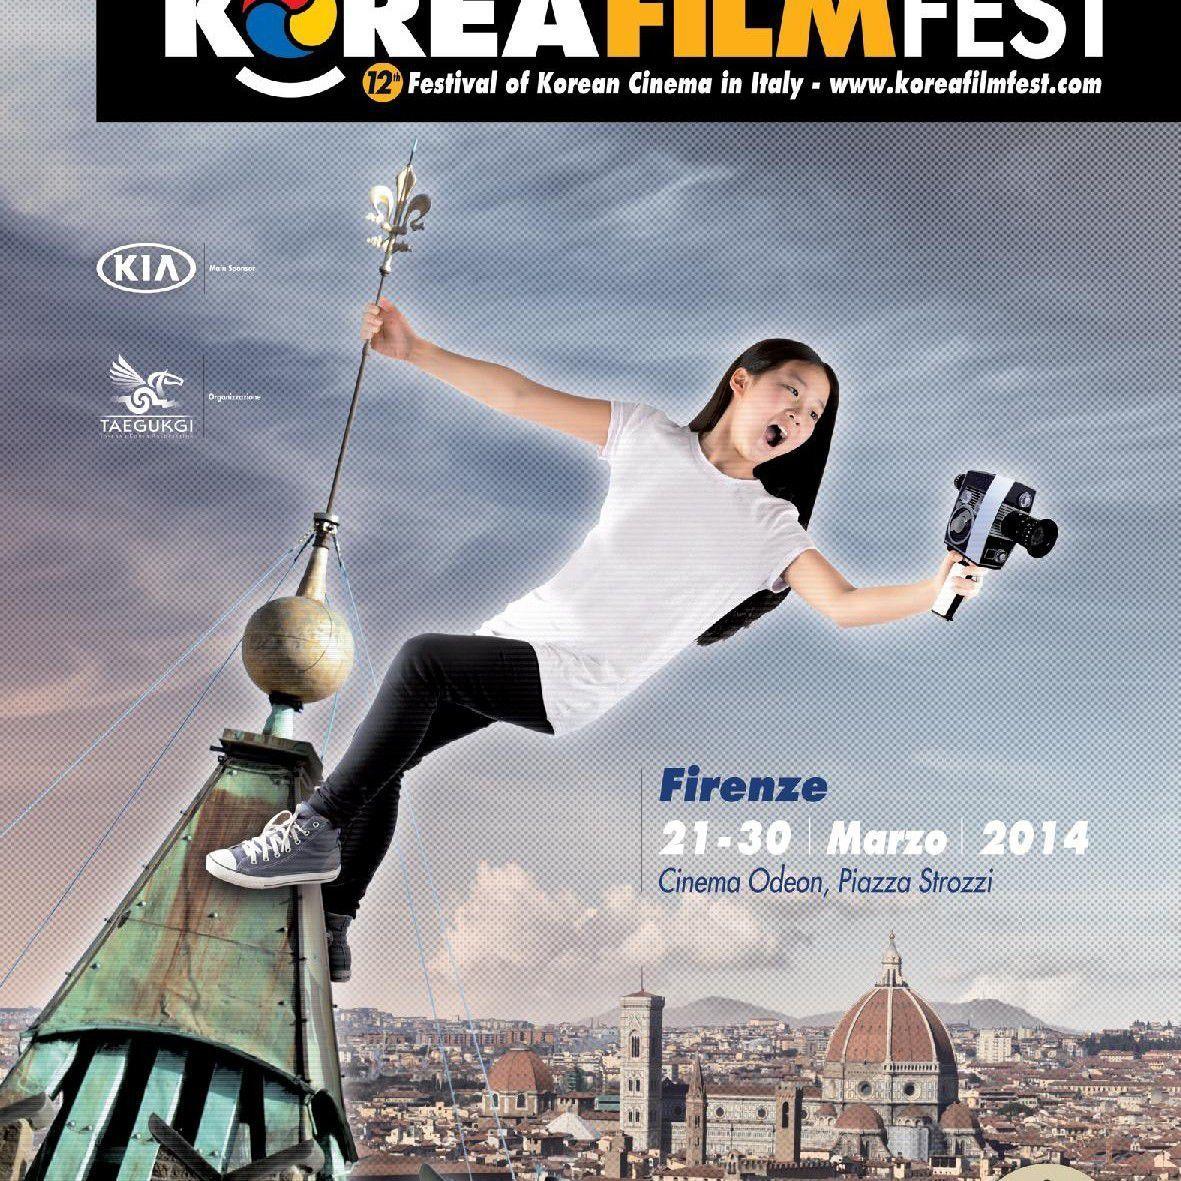 Korea Film Fest, Florence, Italy